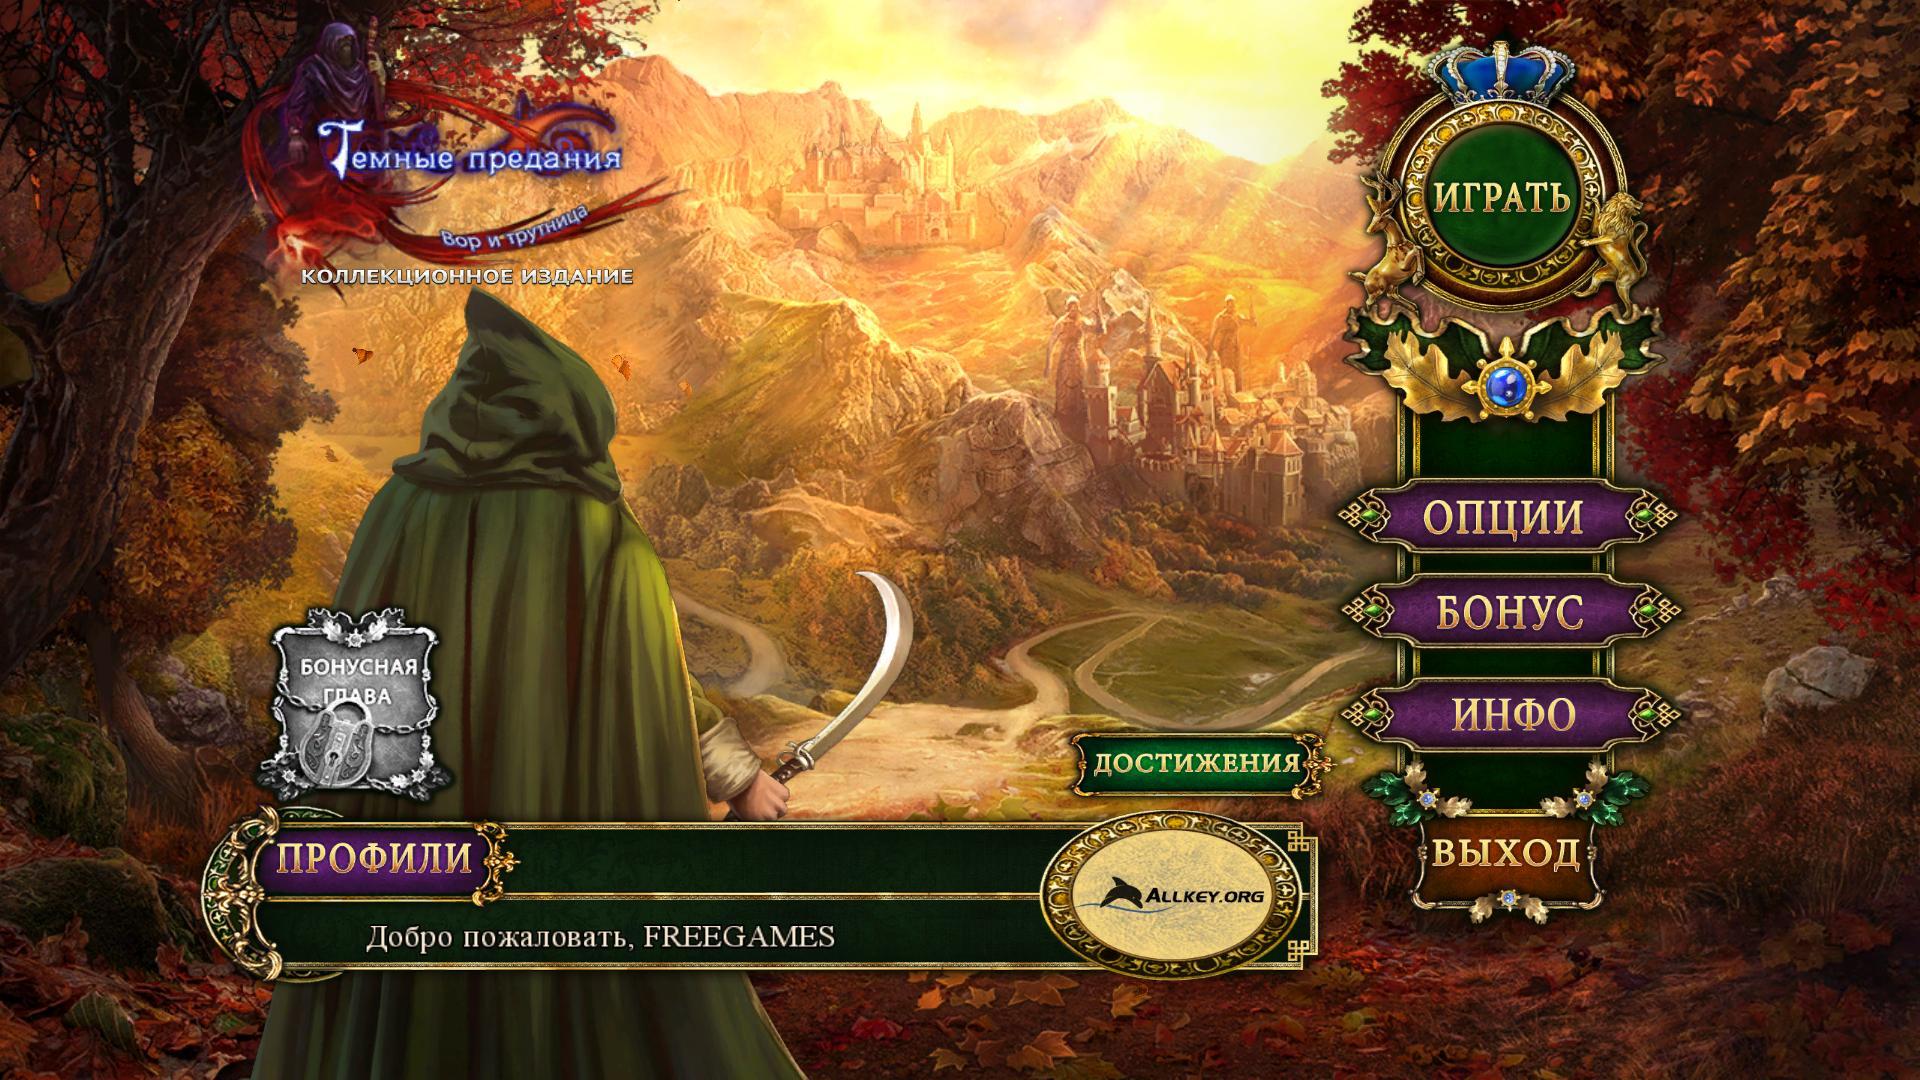 Темные предания 12: Вор и трутница. Коллекционное издание | Dark Parables 12: The Thief And The Tinderbox CE (Rus)